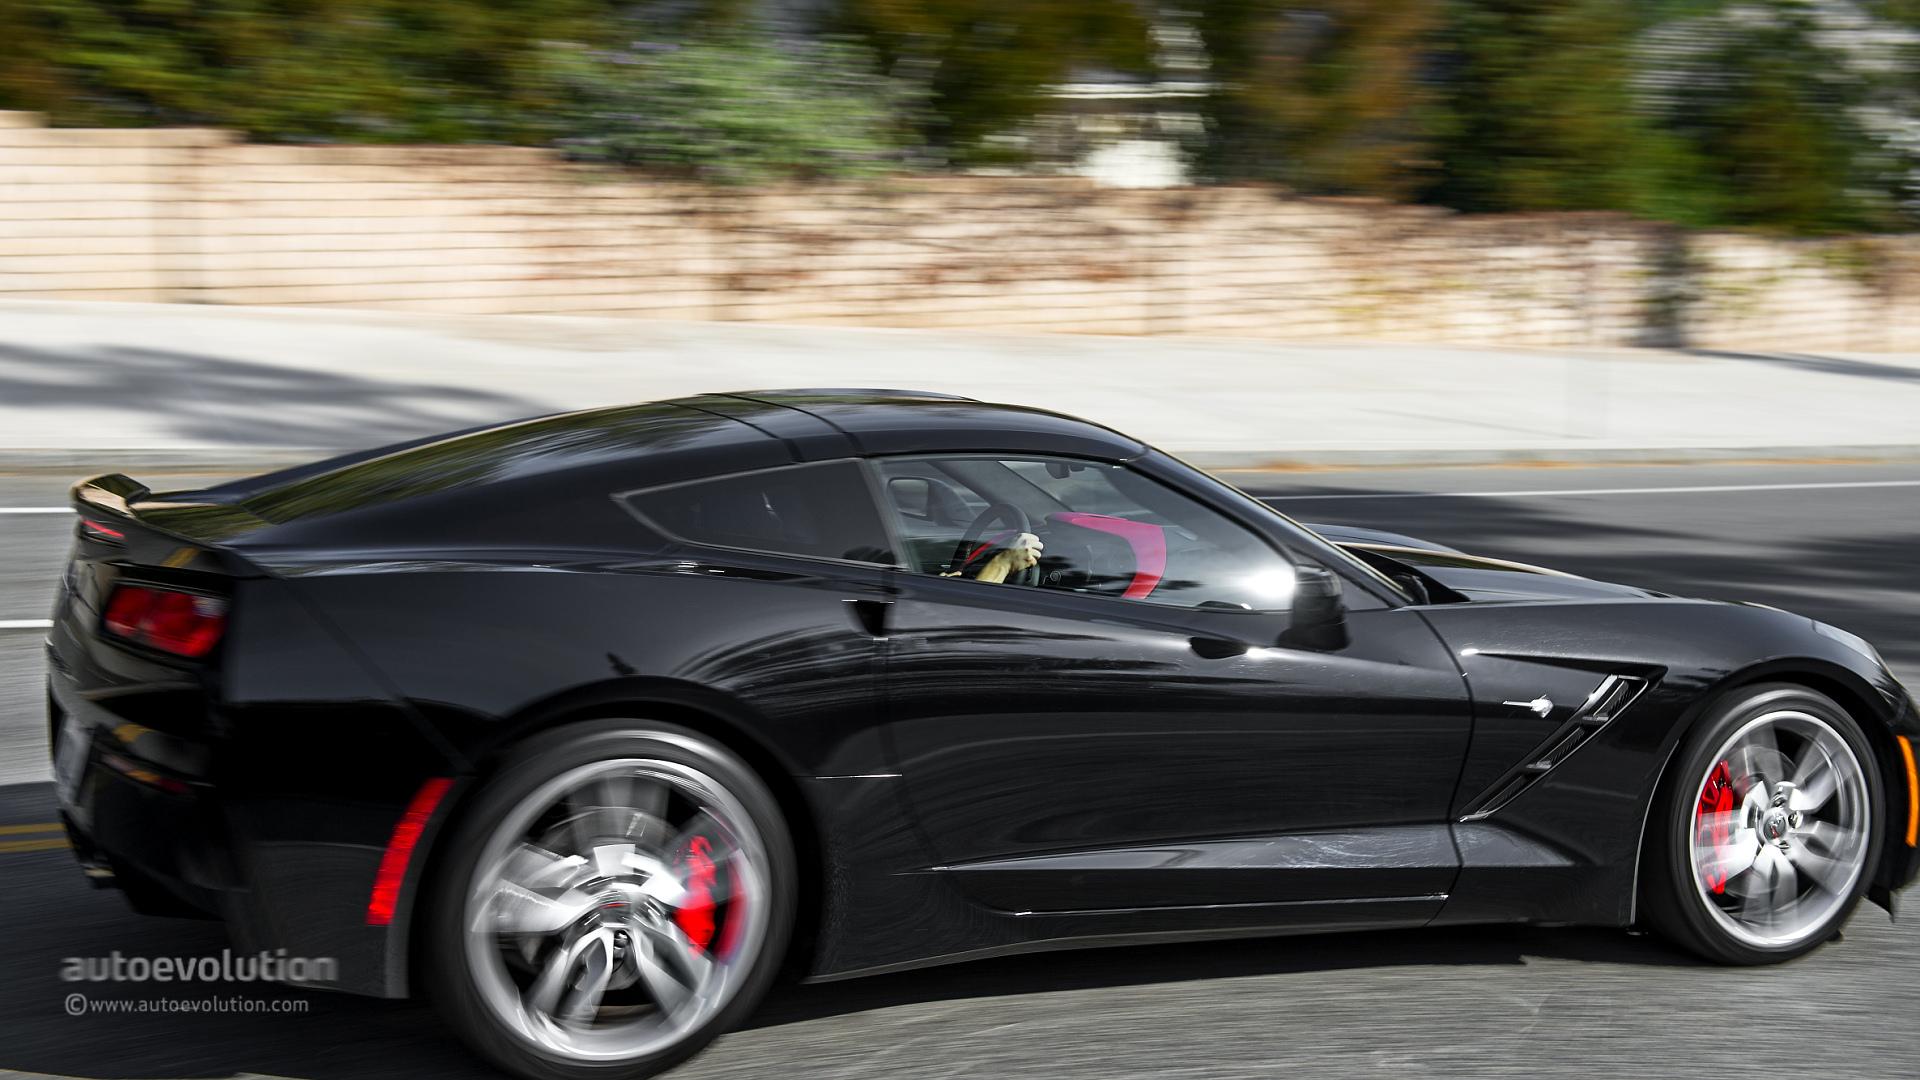 2014 chevrolet corvette stingray review autoevolution. Cars Review. Best American Auto & Cars Review